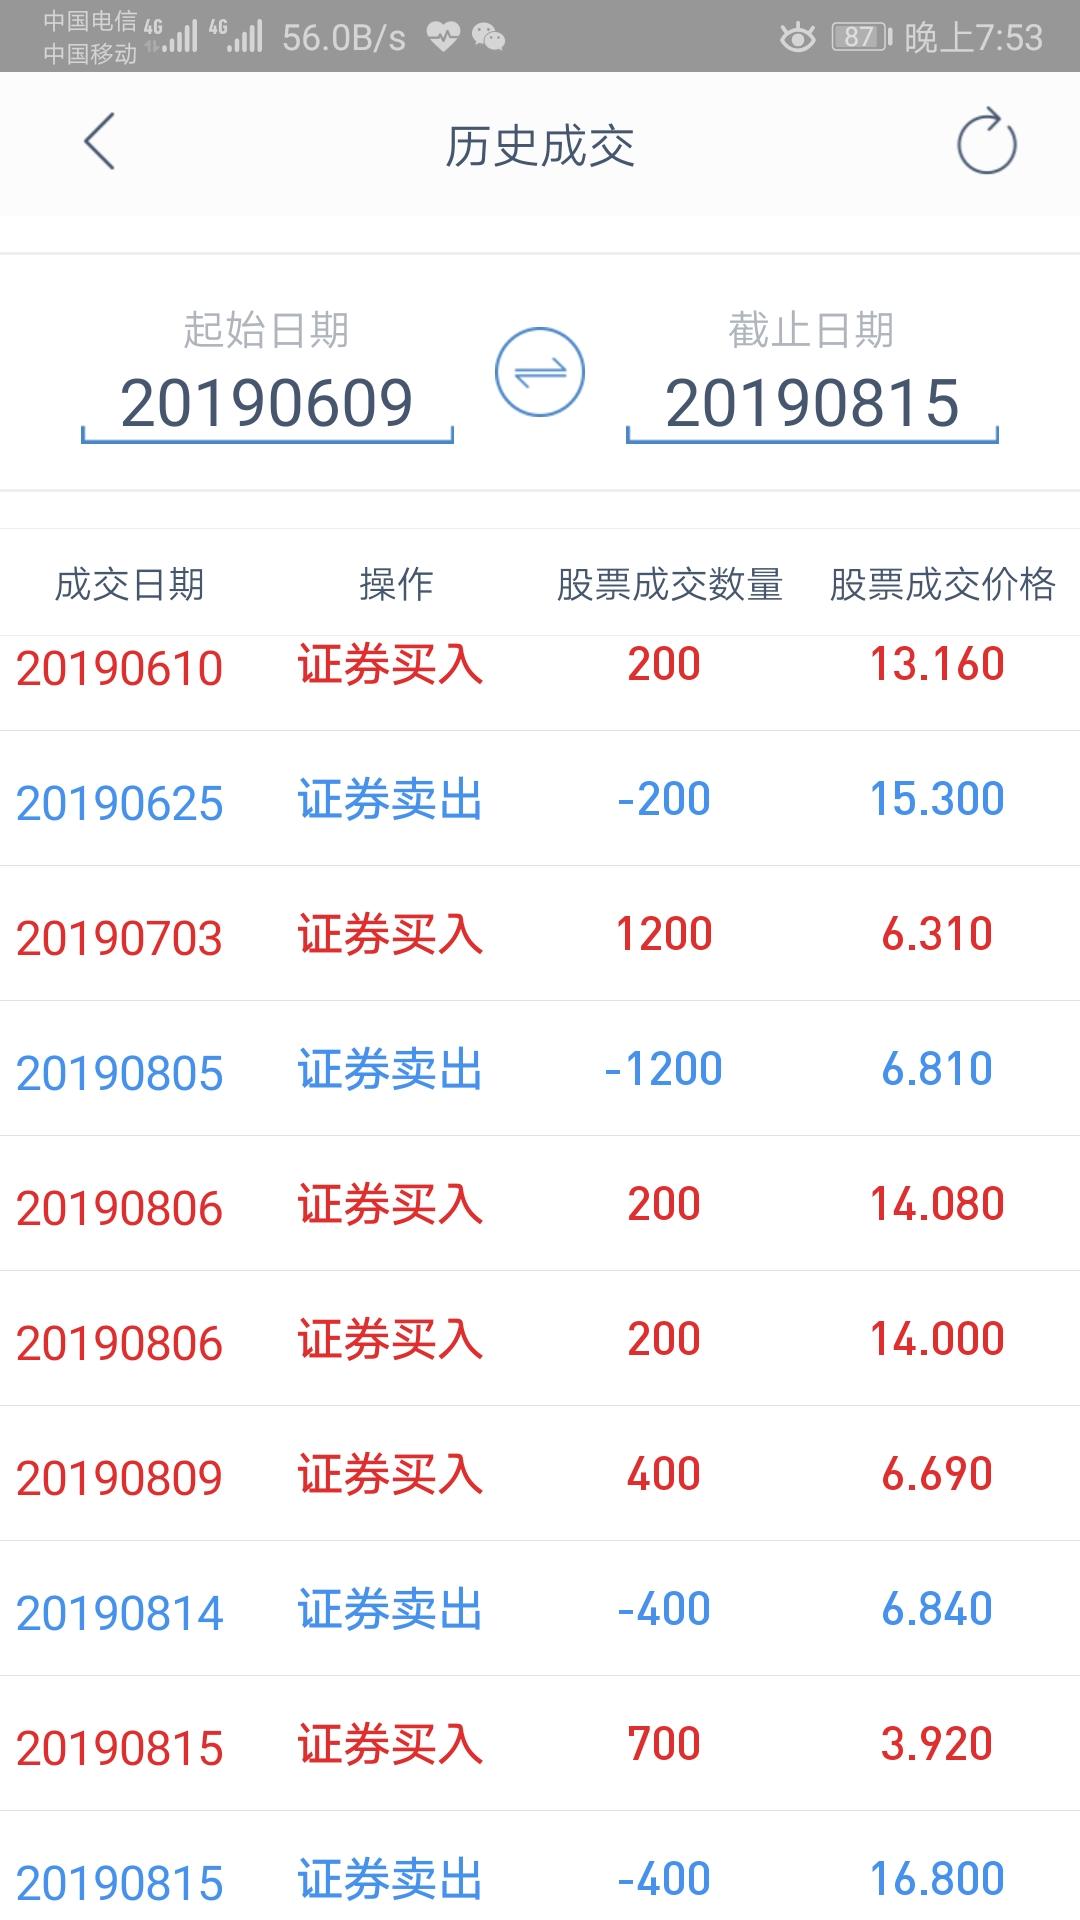 Screenshot_20190816_195325_com.hexin.plat.android.HengtaiSecurity.jpg